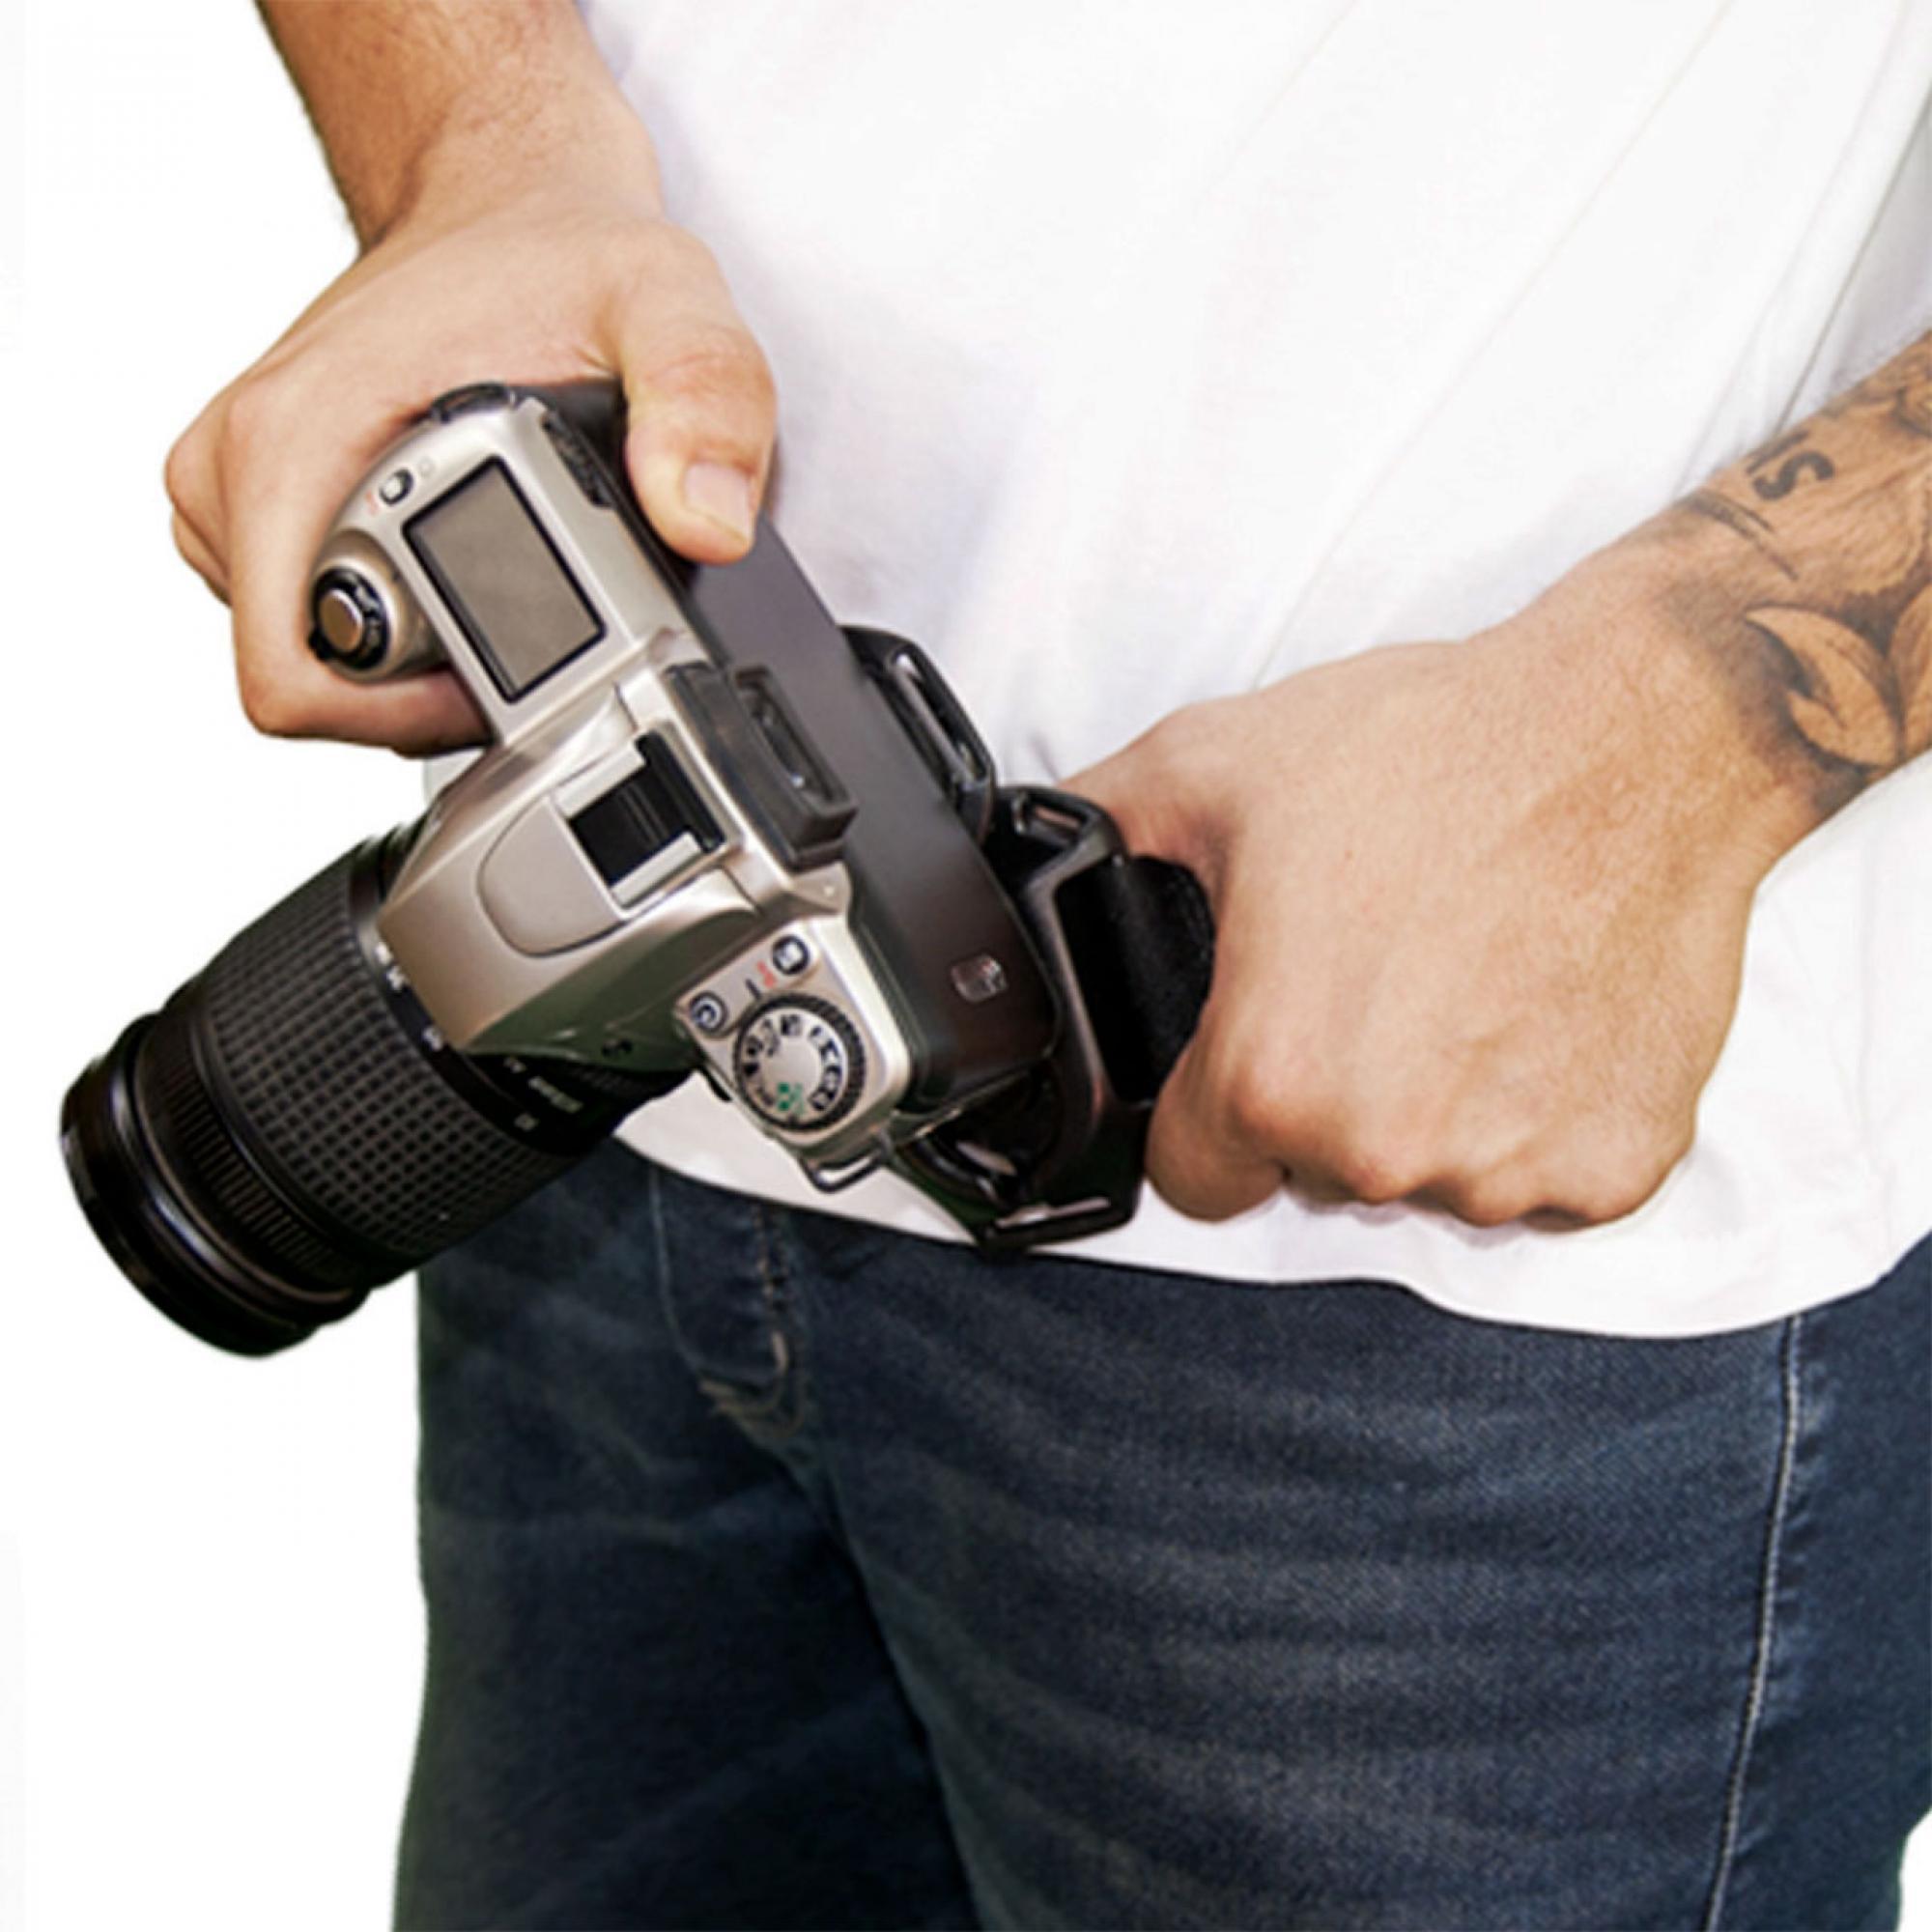 Bolsa Mala Fotográfica Alhva Style G Maleta Fotógrafos Câmeras e Lentes